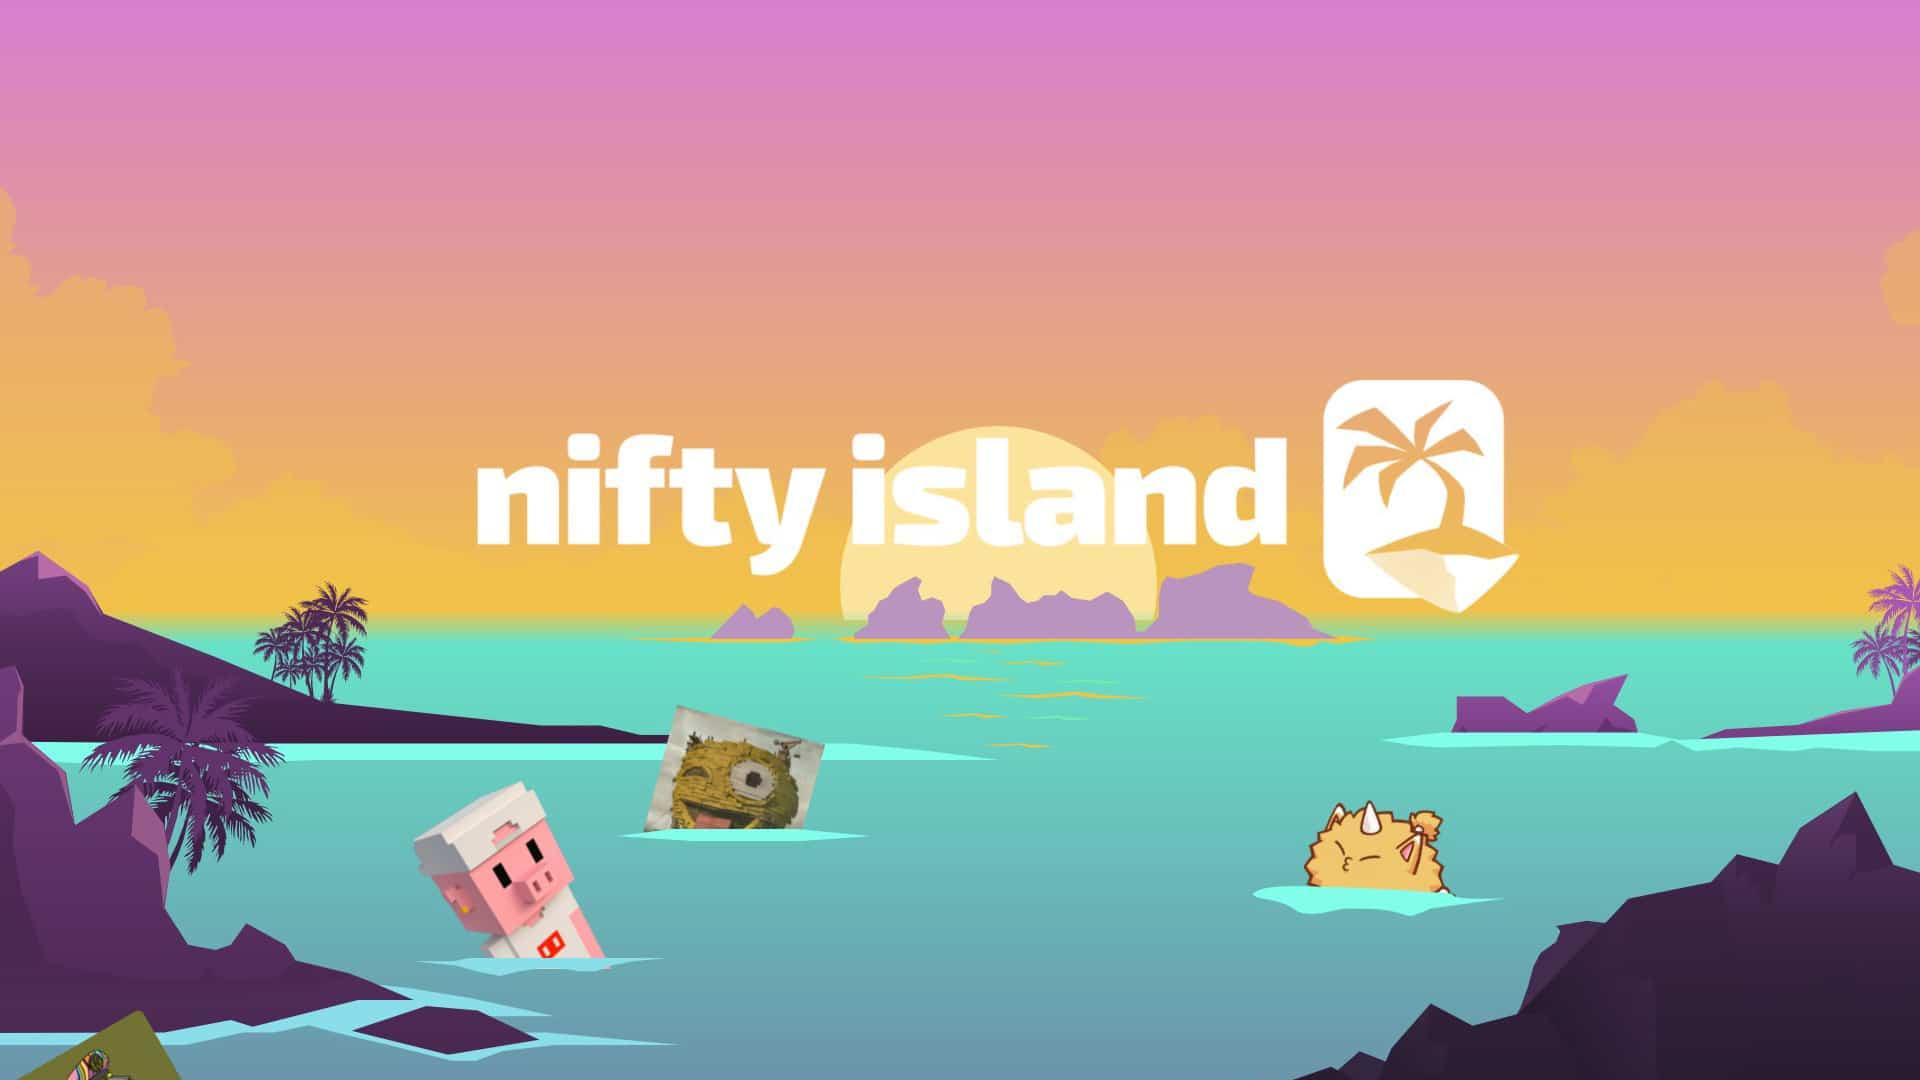 Nifty Island